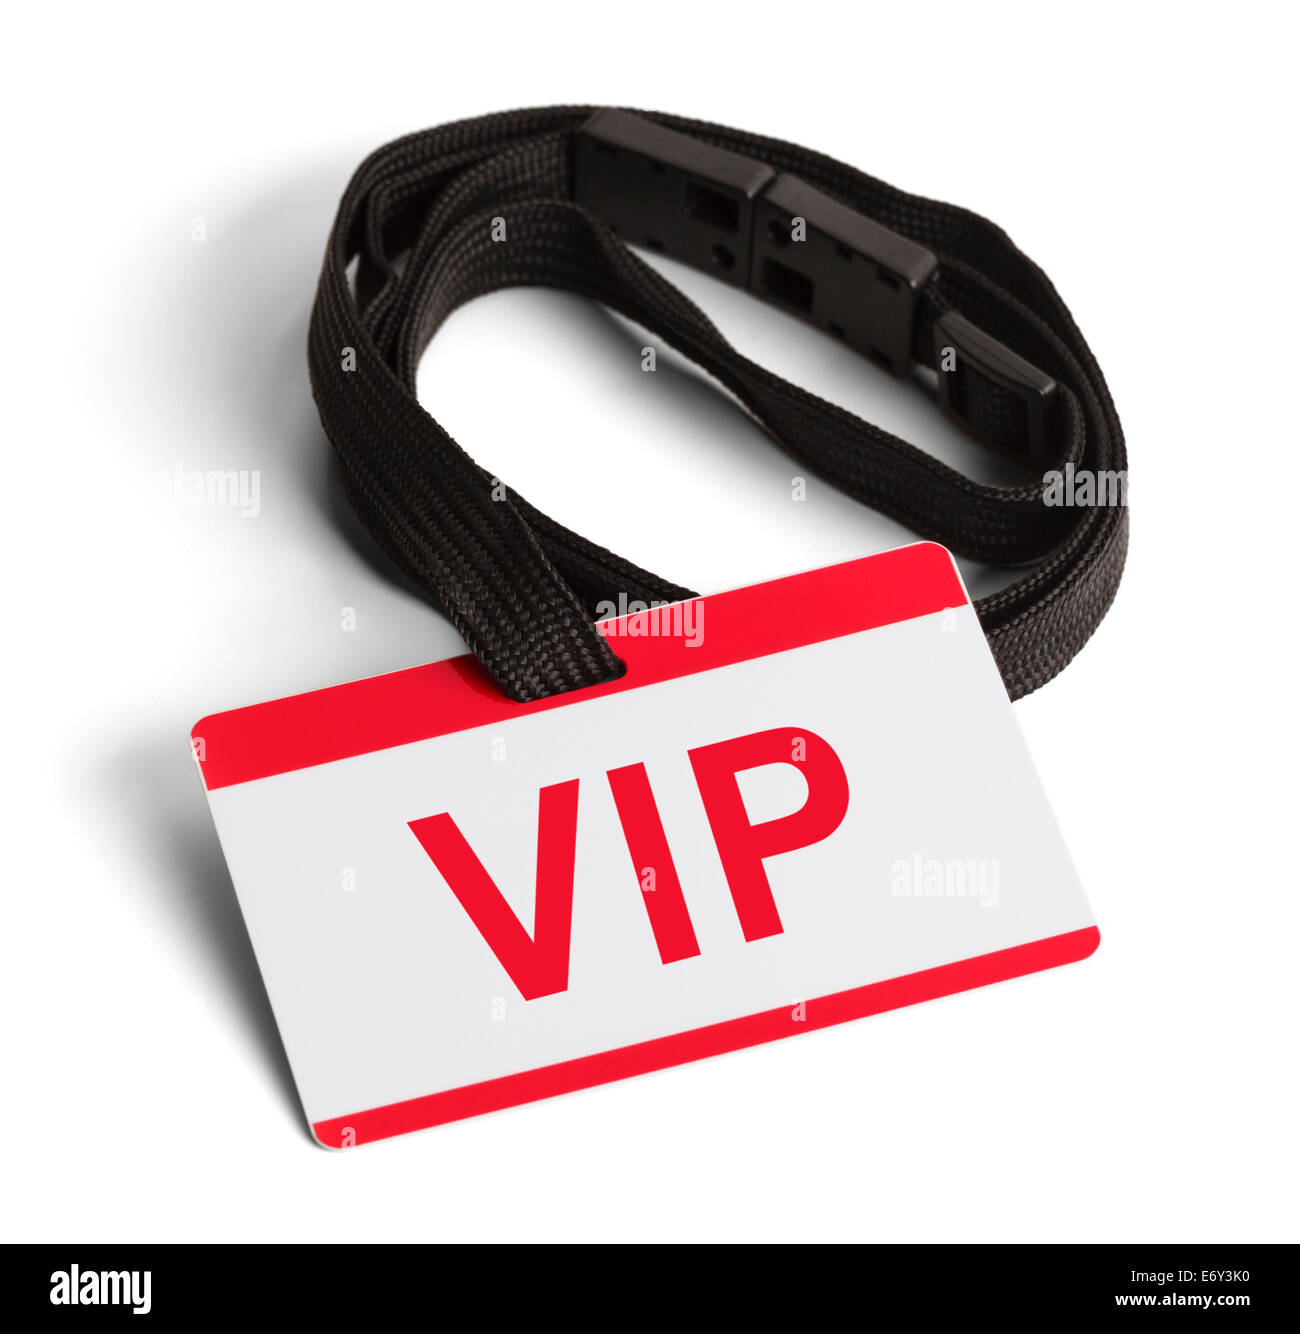 Rote und weiße VIP Ausweis Isolated on White Background. Stockfoto